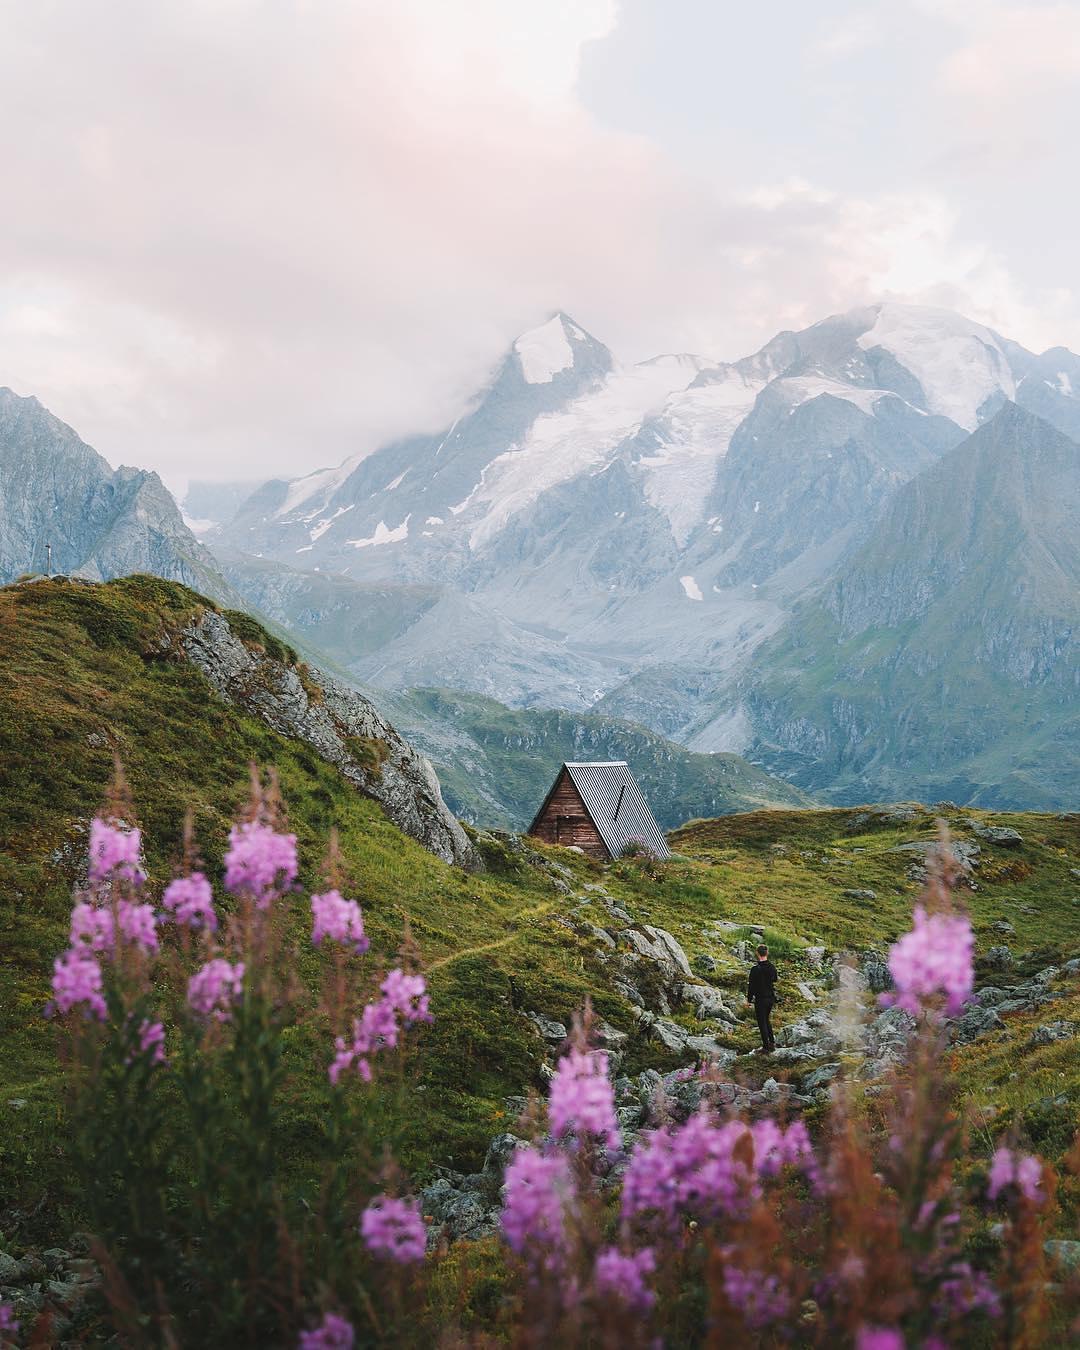 Visit Switzerland summer contest photo by Dominik Sartorius doeeme